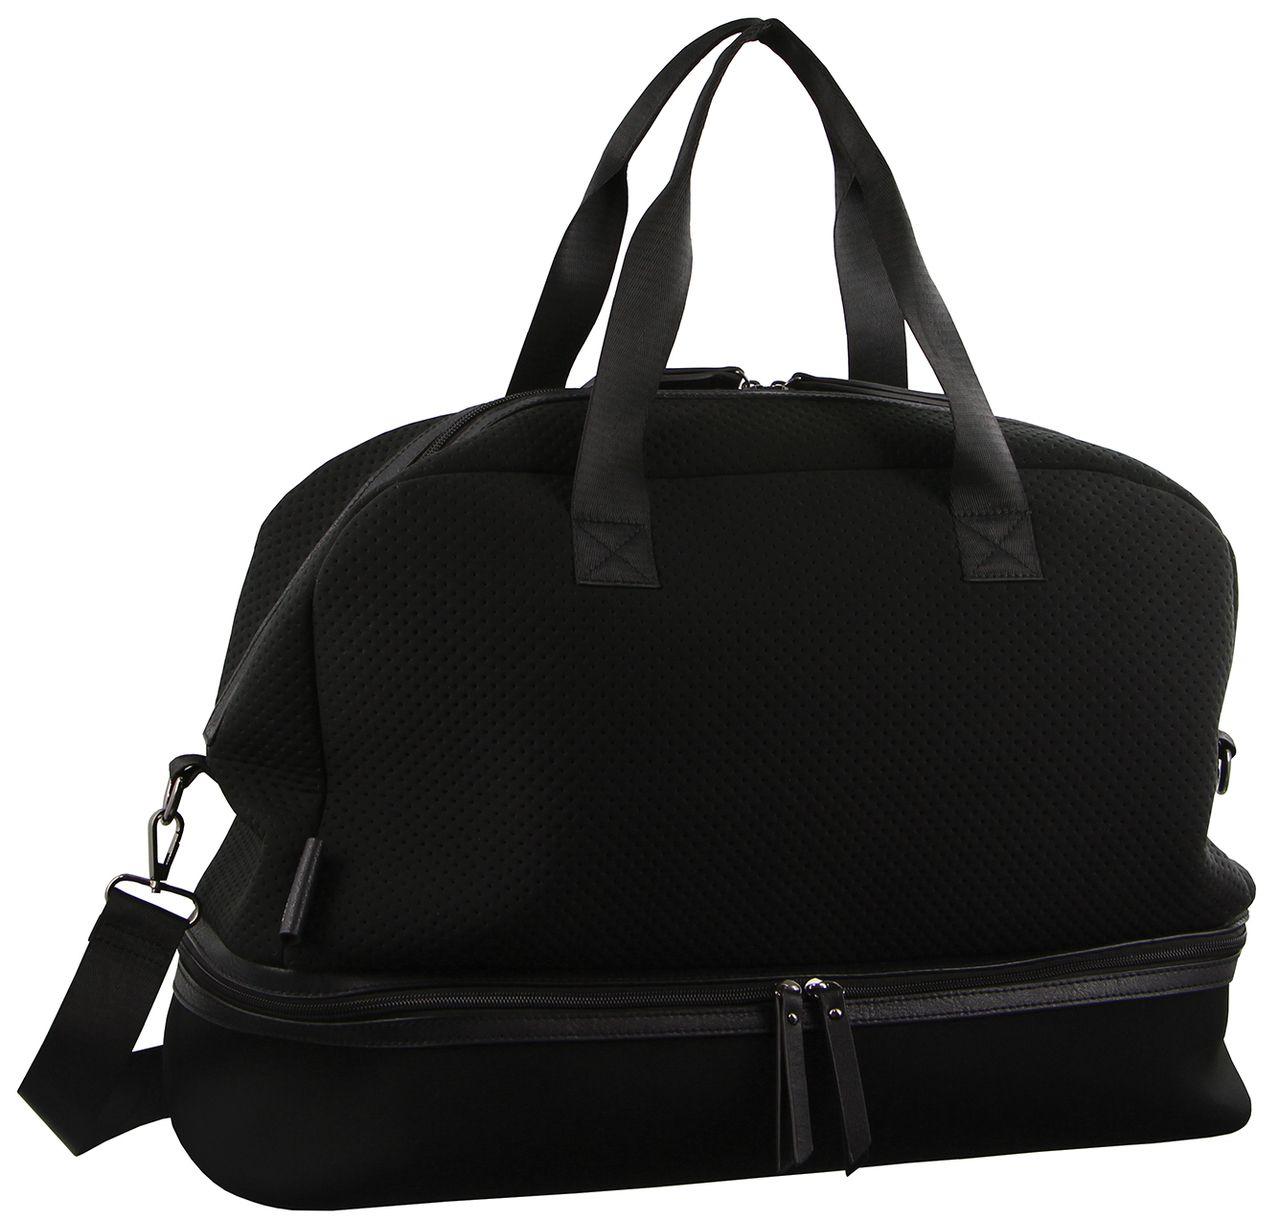 Milleni Neoprene Gym Overnight Bag